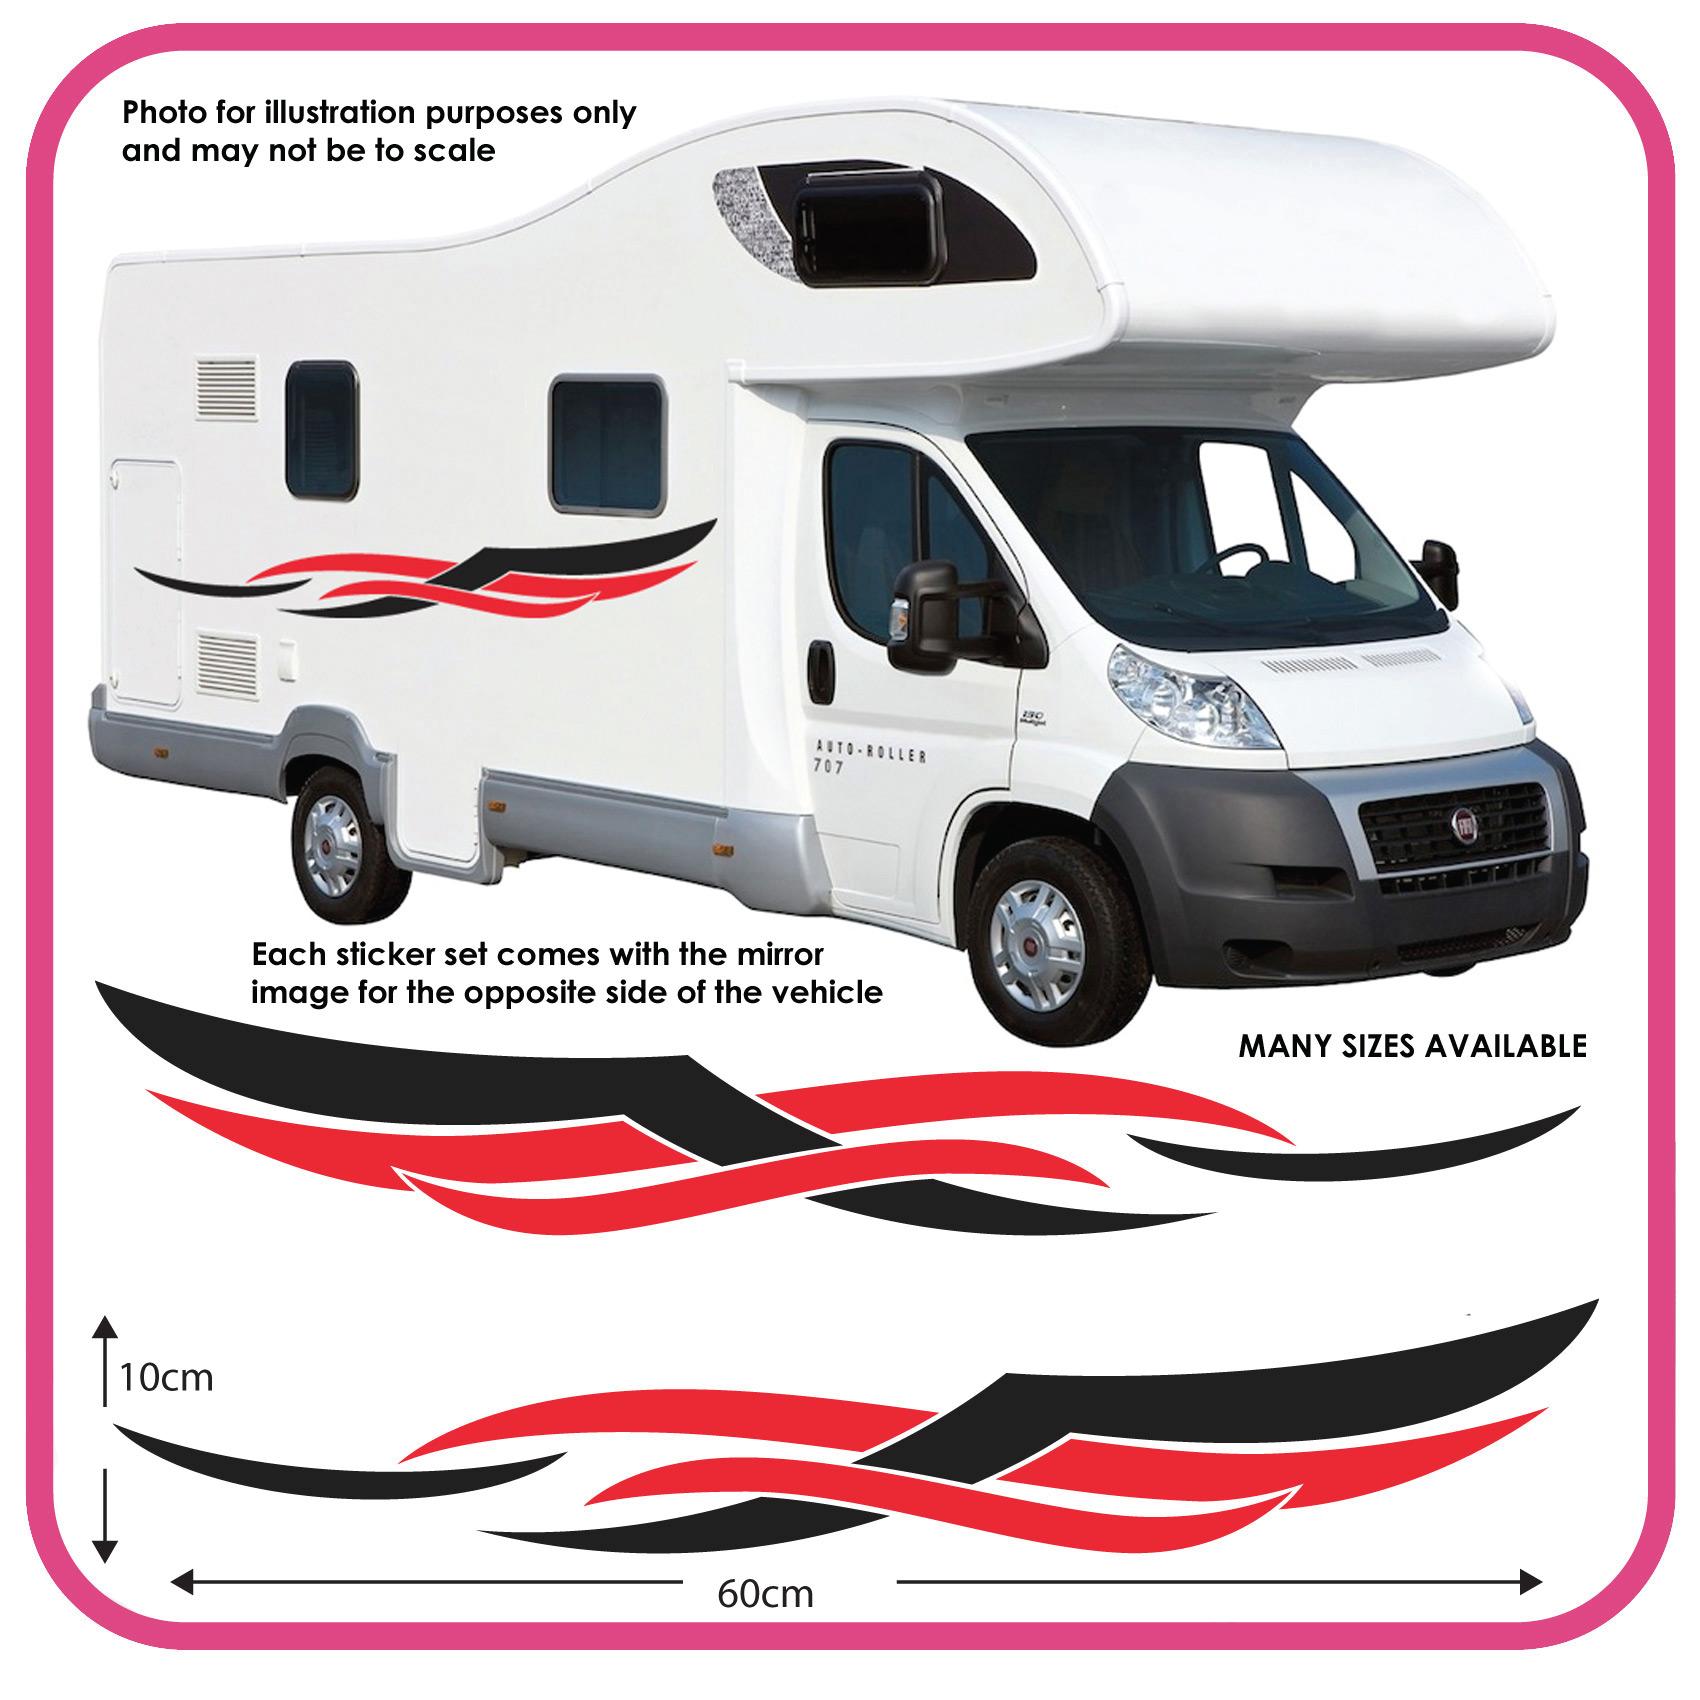 motorhome vinyl graphics stickers decals camper van rv caravan horsebox mh4a ebay. Black Bedroom Furniture Sets. Home Design Ideas